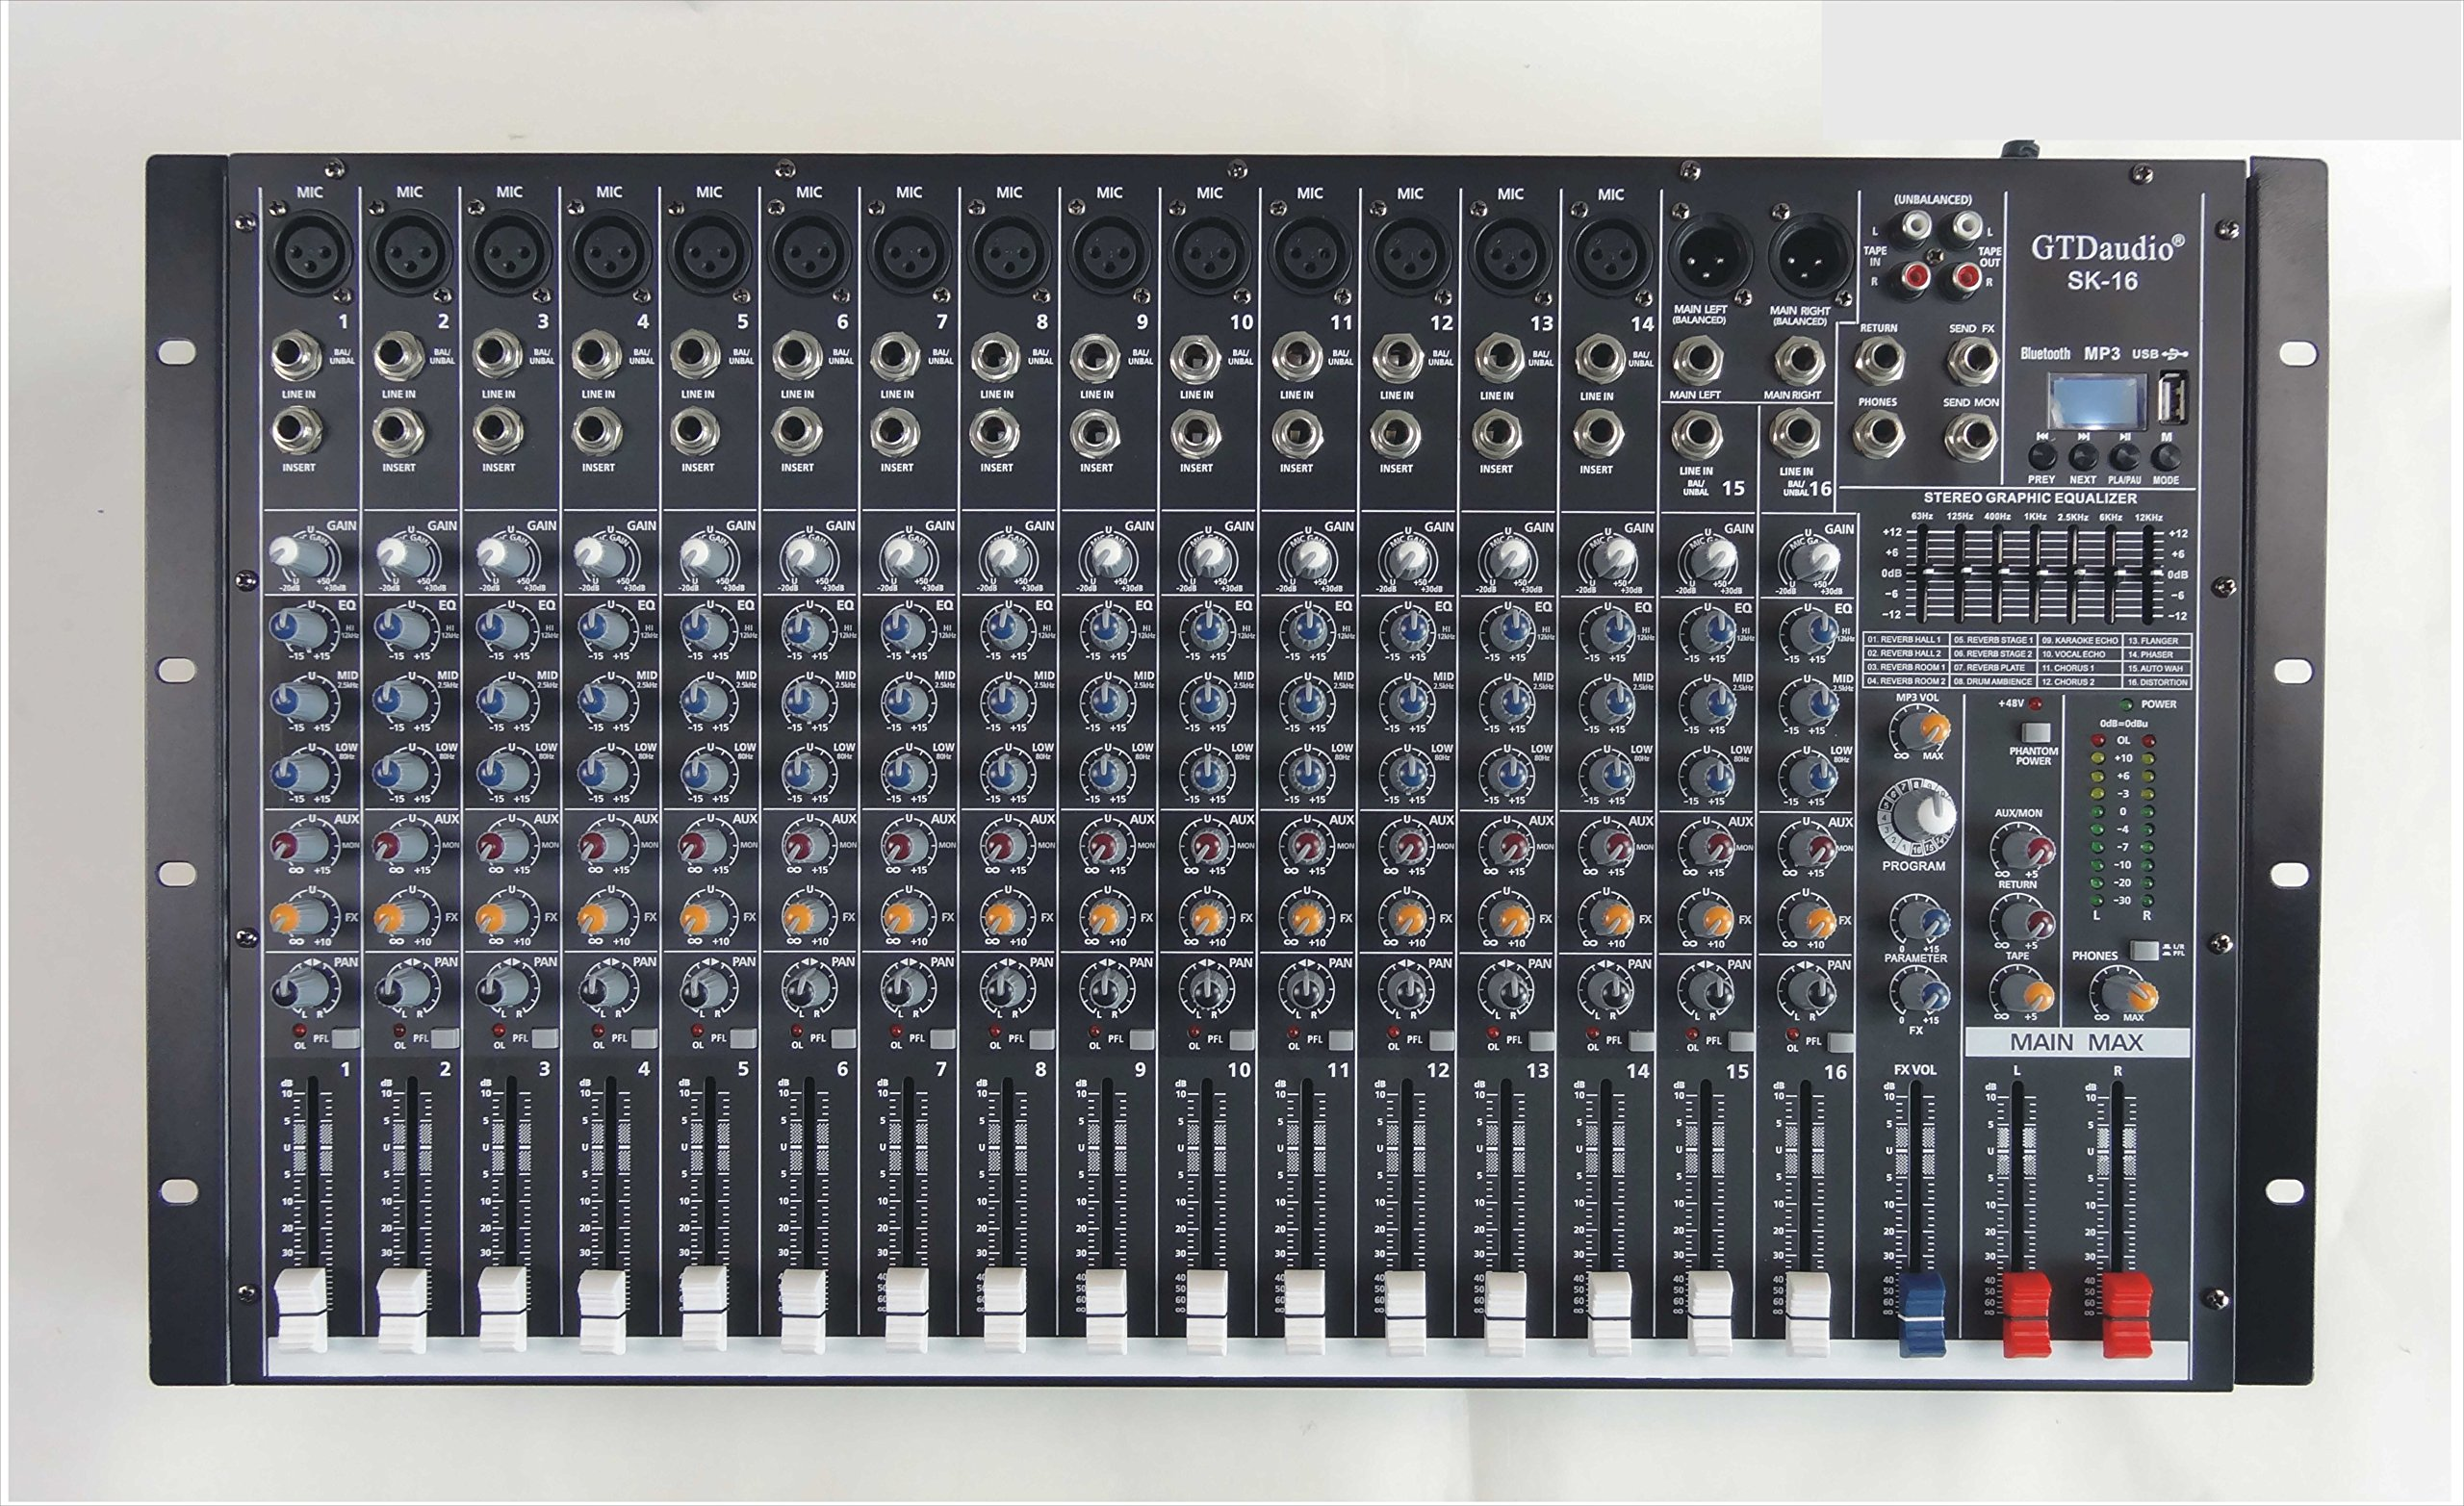 GTD-Audio 16 Channel 4000Watt Professional Powered Mixer Amplifier (1000 Watt RMS )